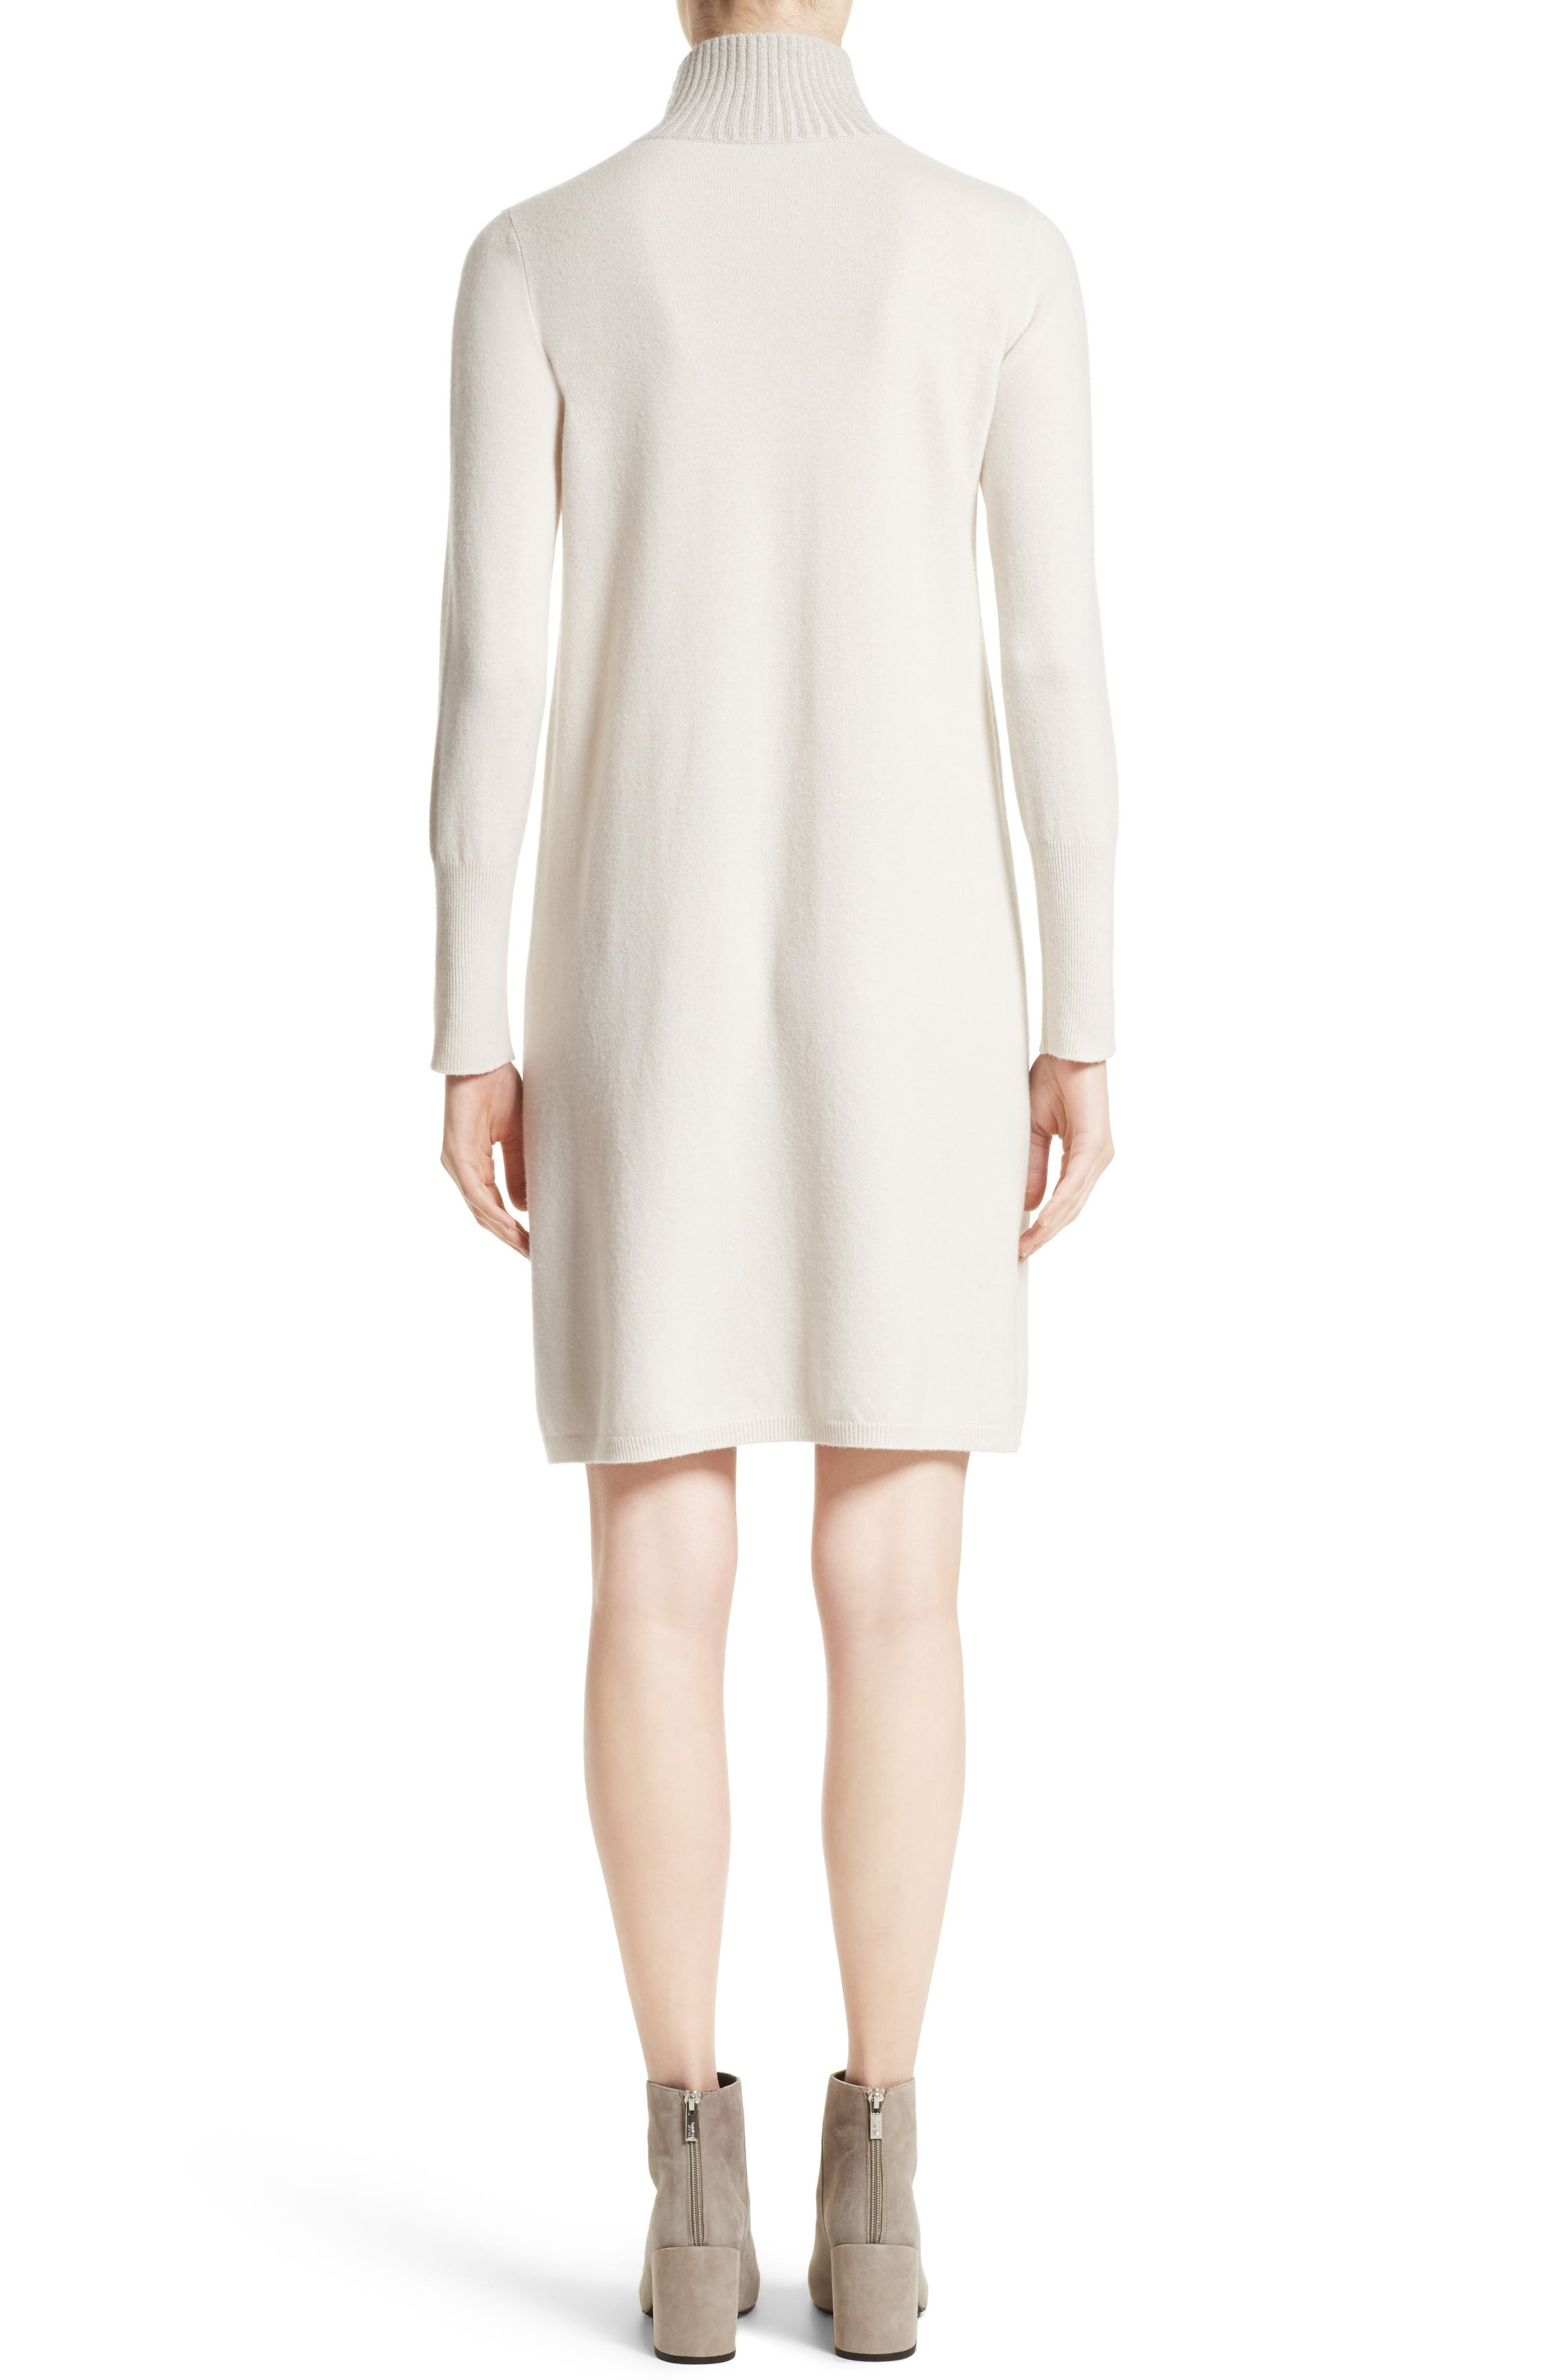 Wool, Silk & Cashmere Knit Dress,                             Alternate thumbnail 2, color,                             101